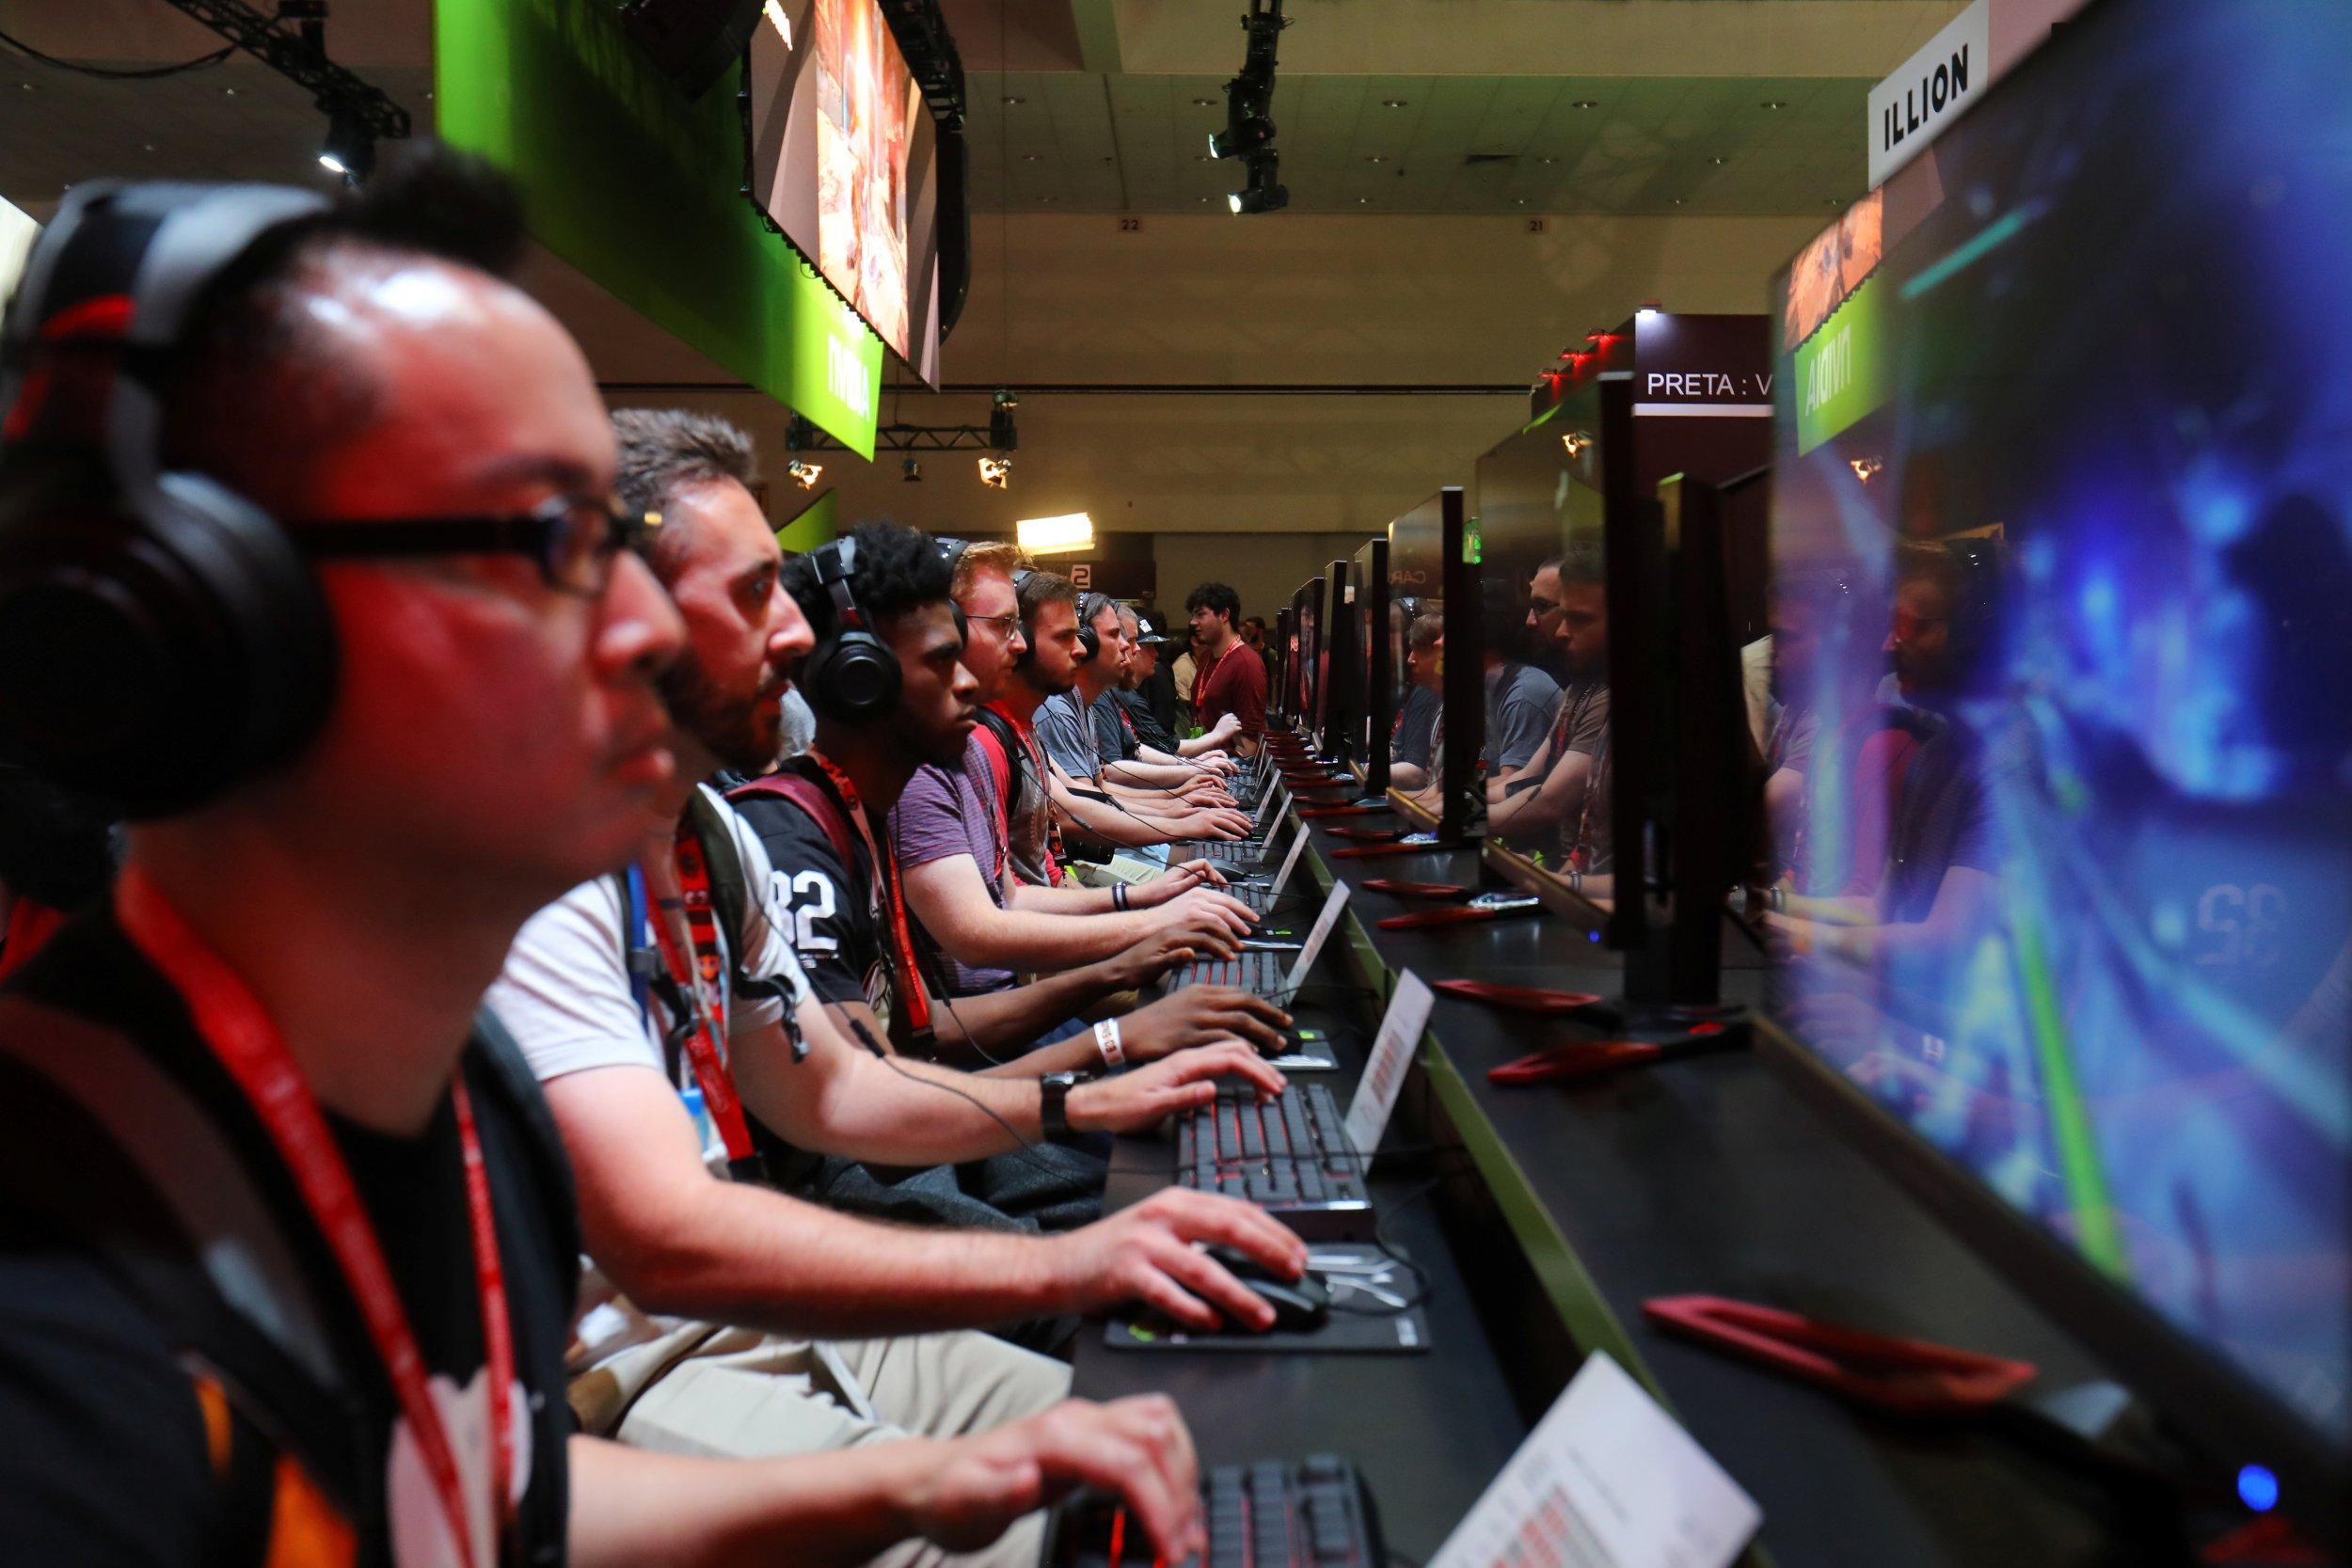 0726_video__games_stress_01